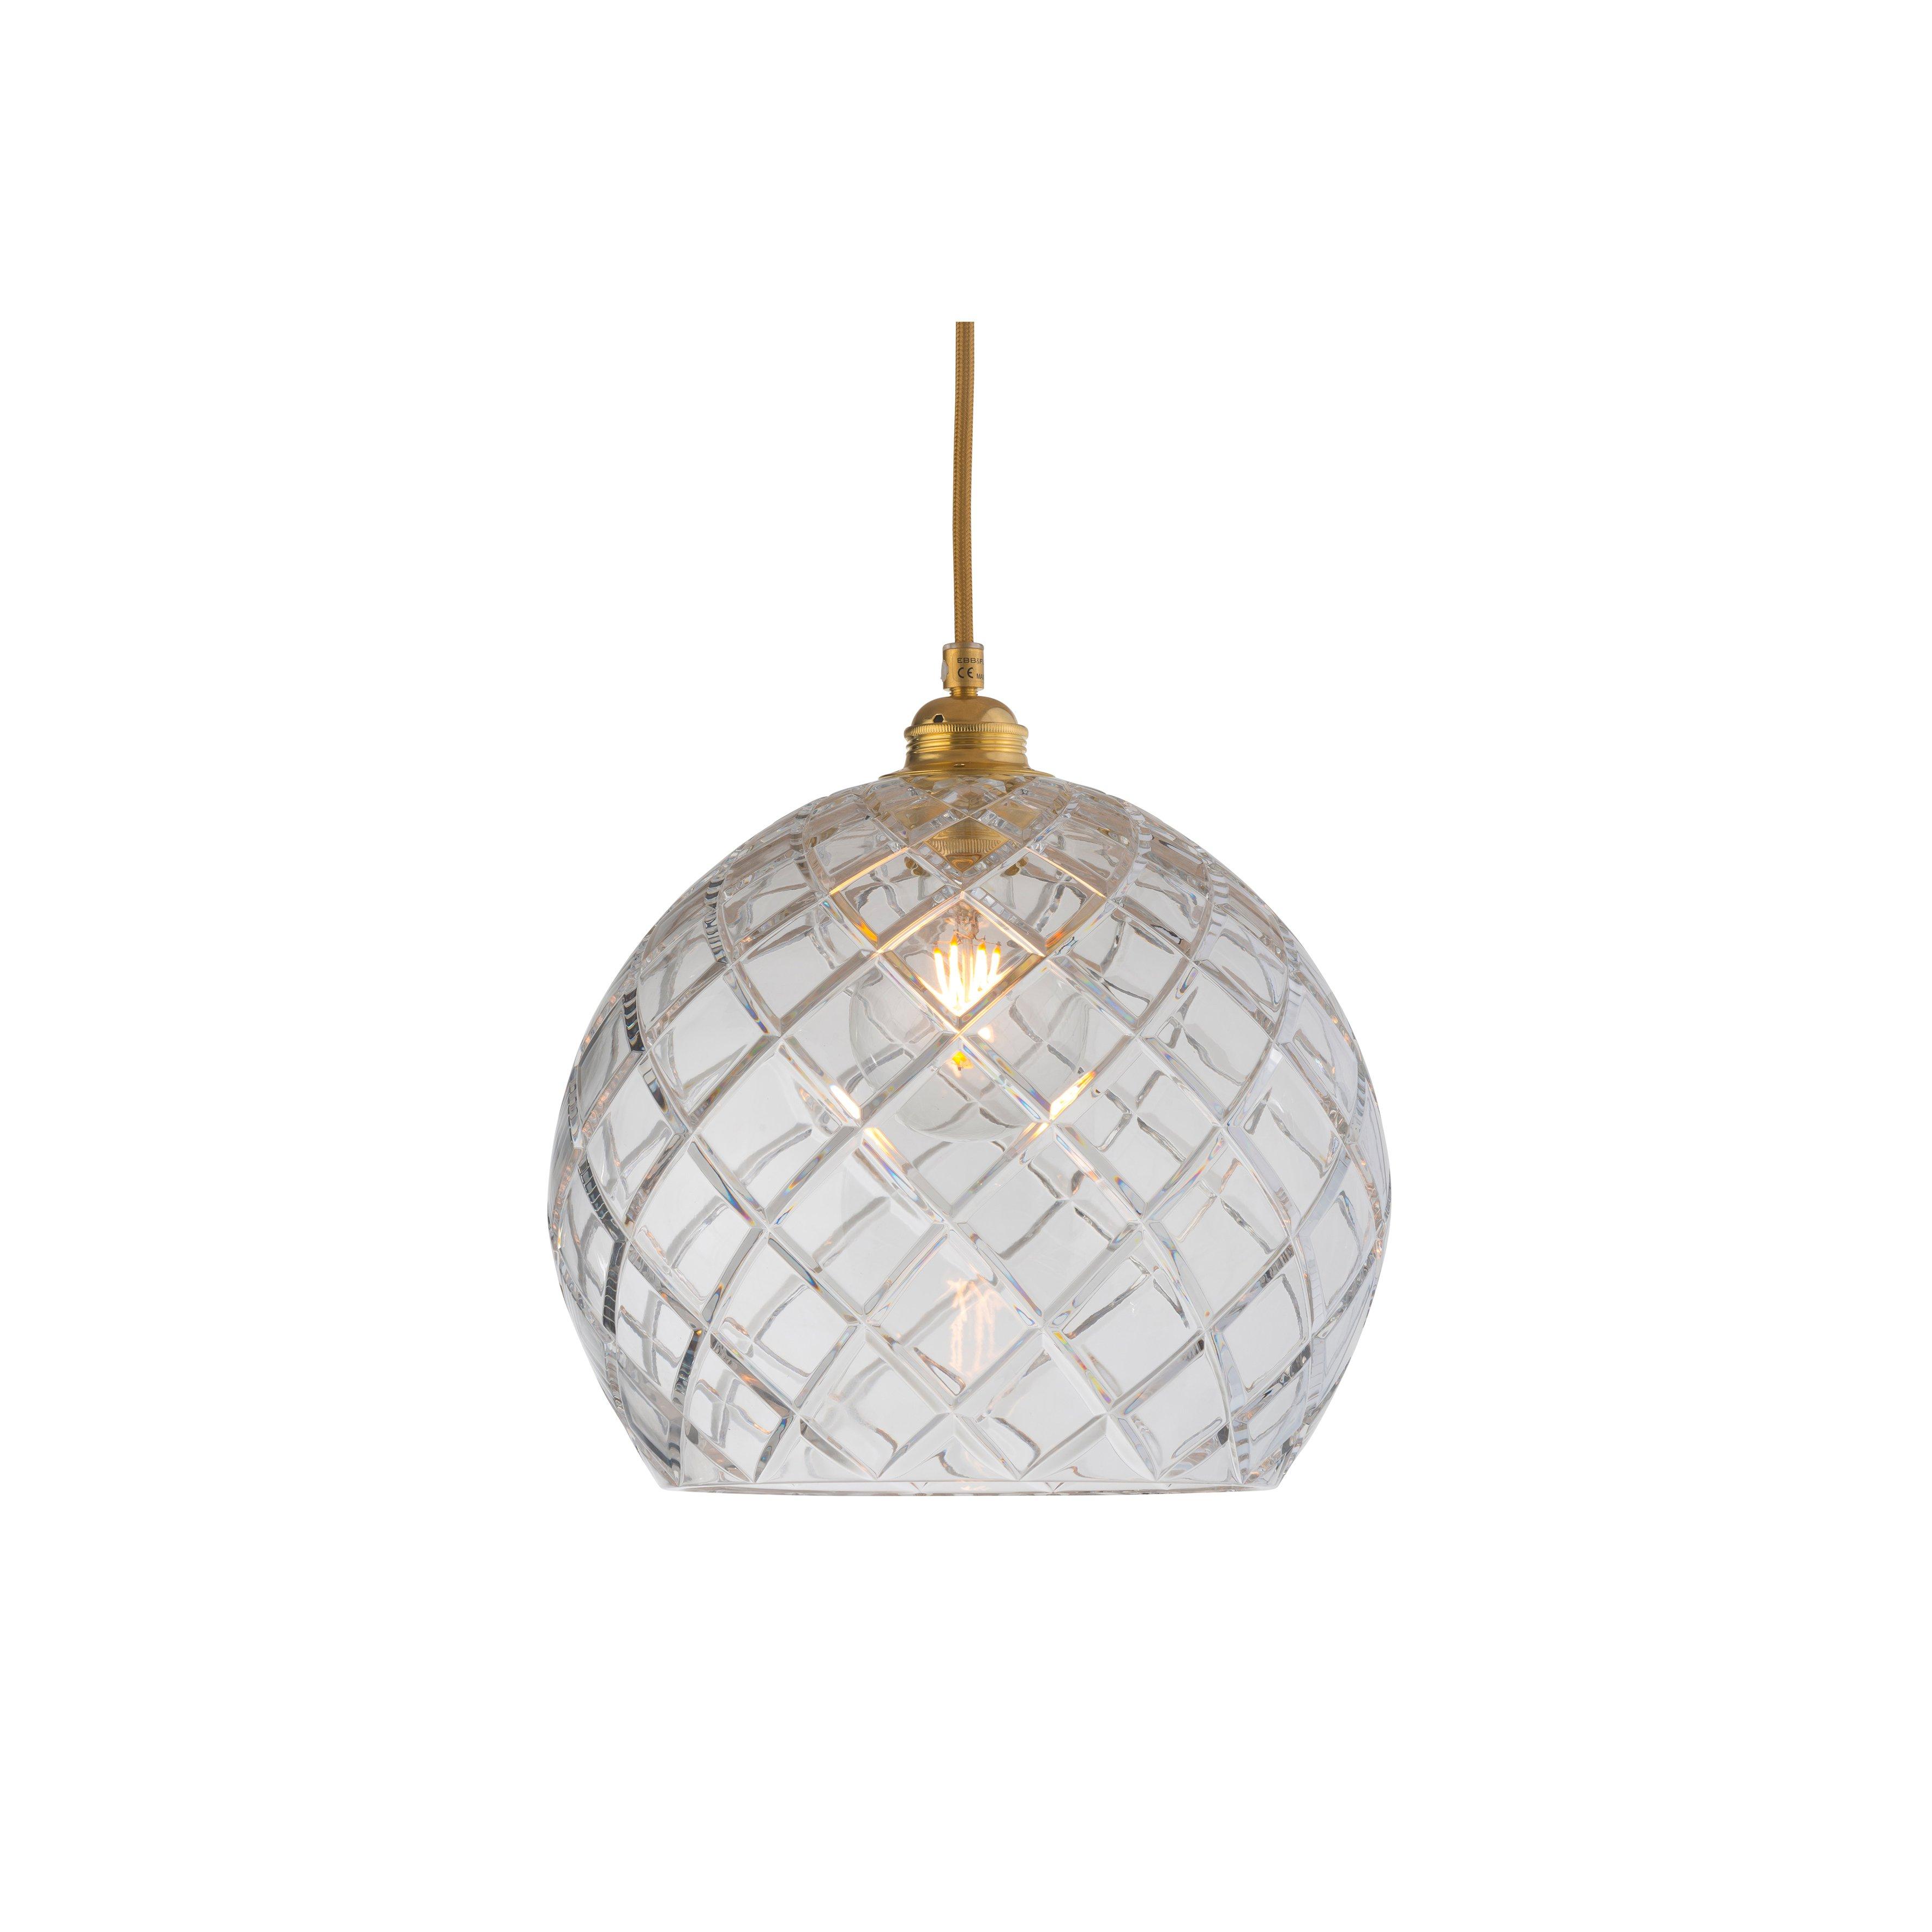 image-Rowan Crystal Pendant Lamp, 28cm, Gold, Large Check